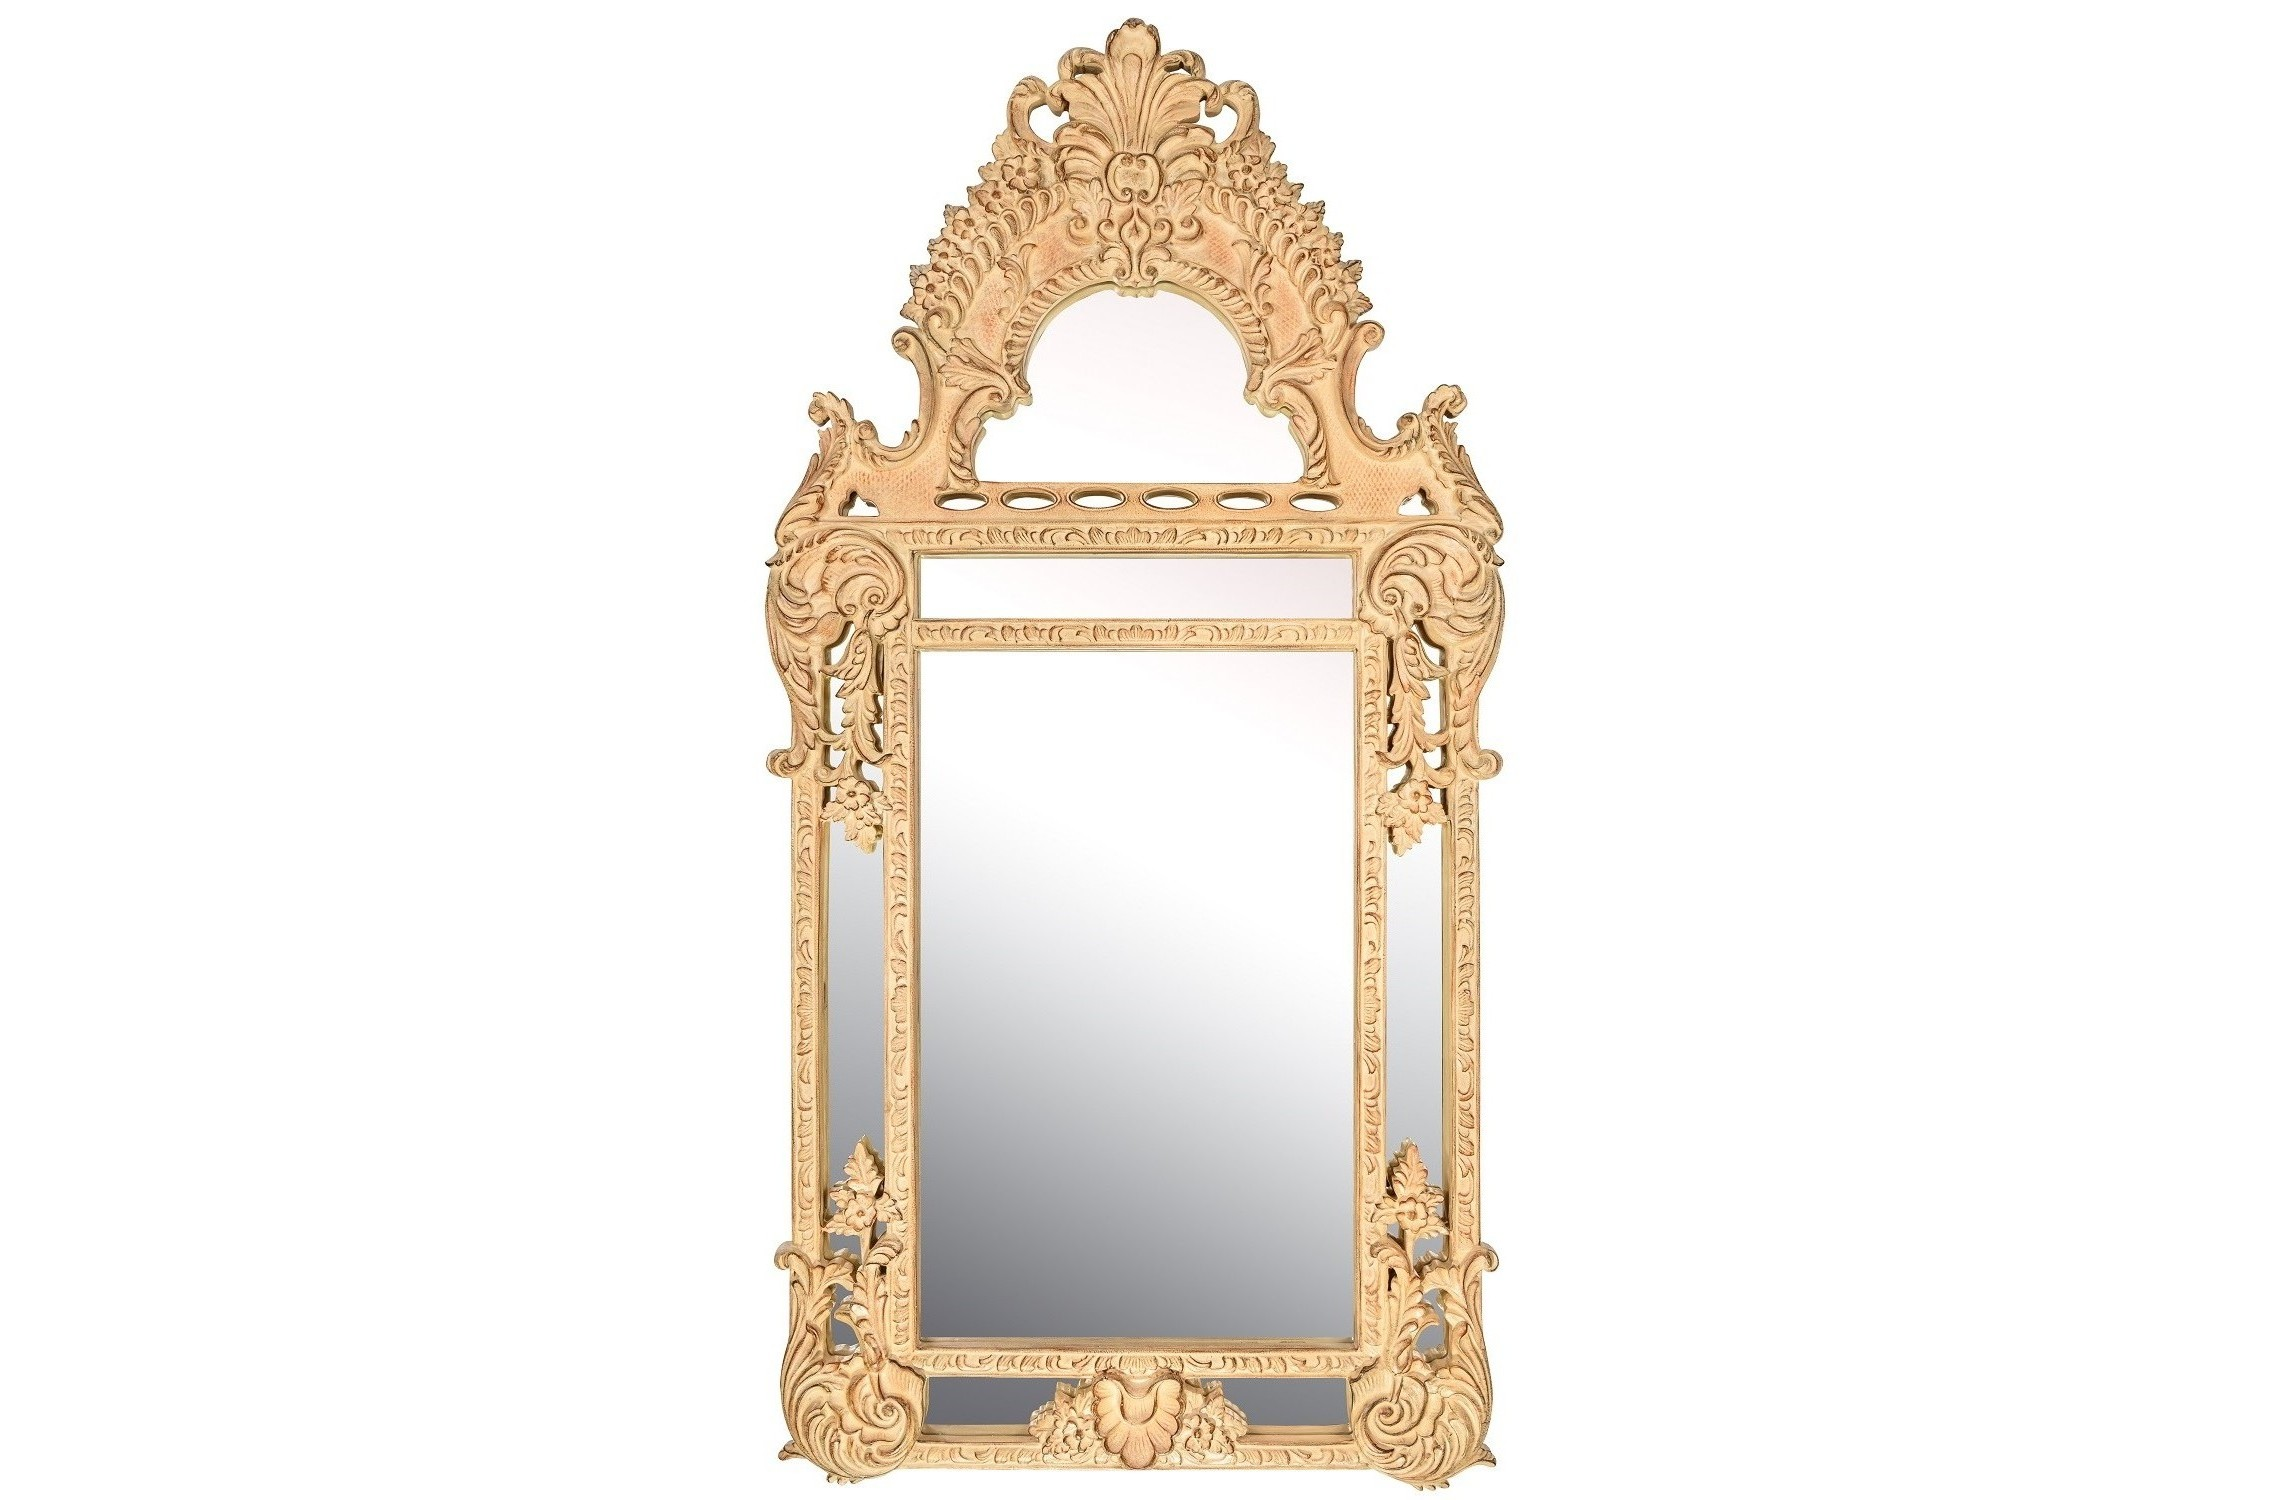 Зеркало Palace IvoryНастенные зеркала<br><br><br>Material: Полирезин<br>Width см: 75<br>Depth см: 4.5<br>Height см: 145